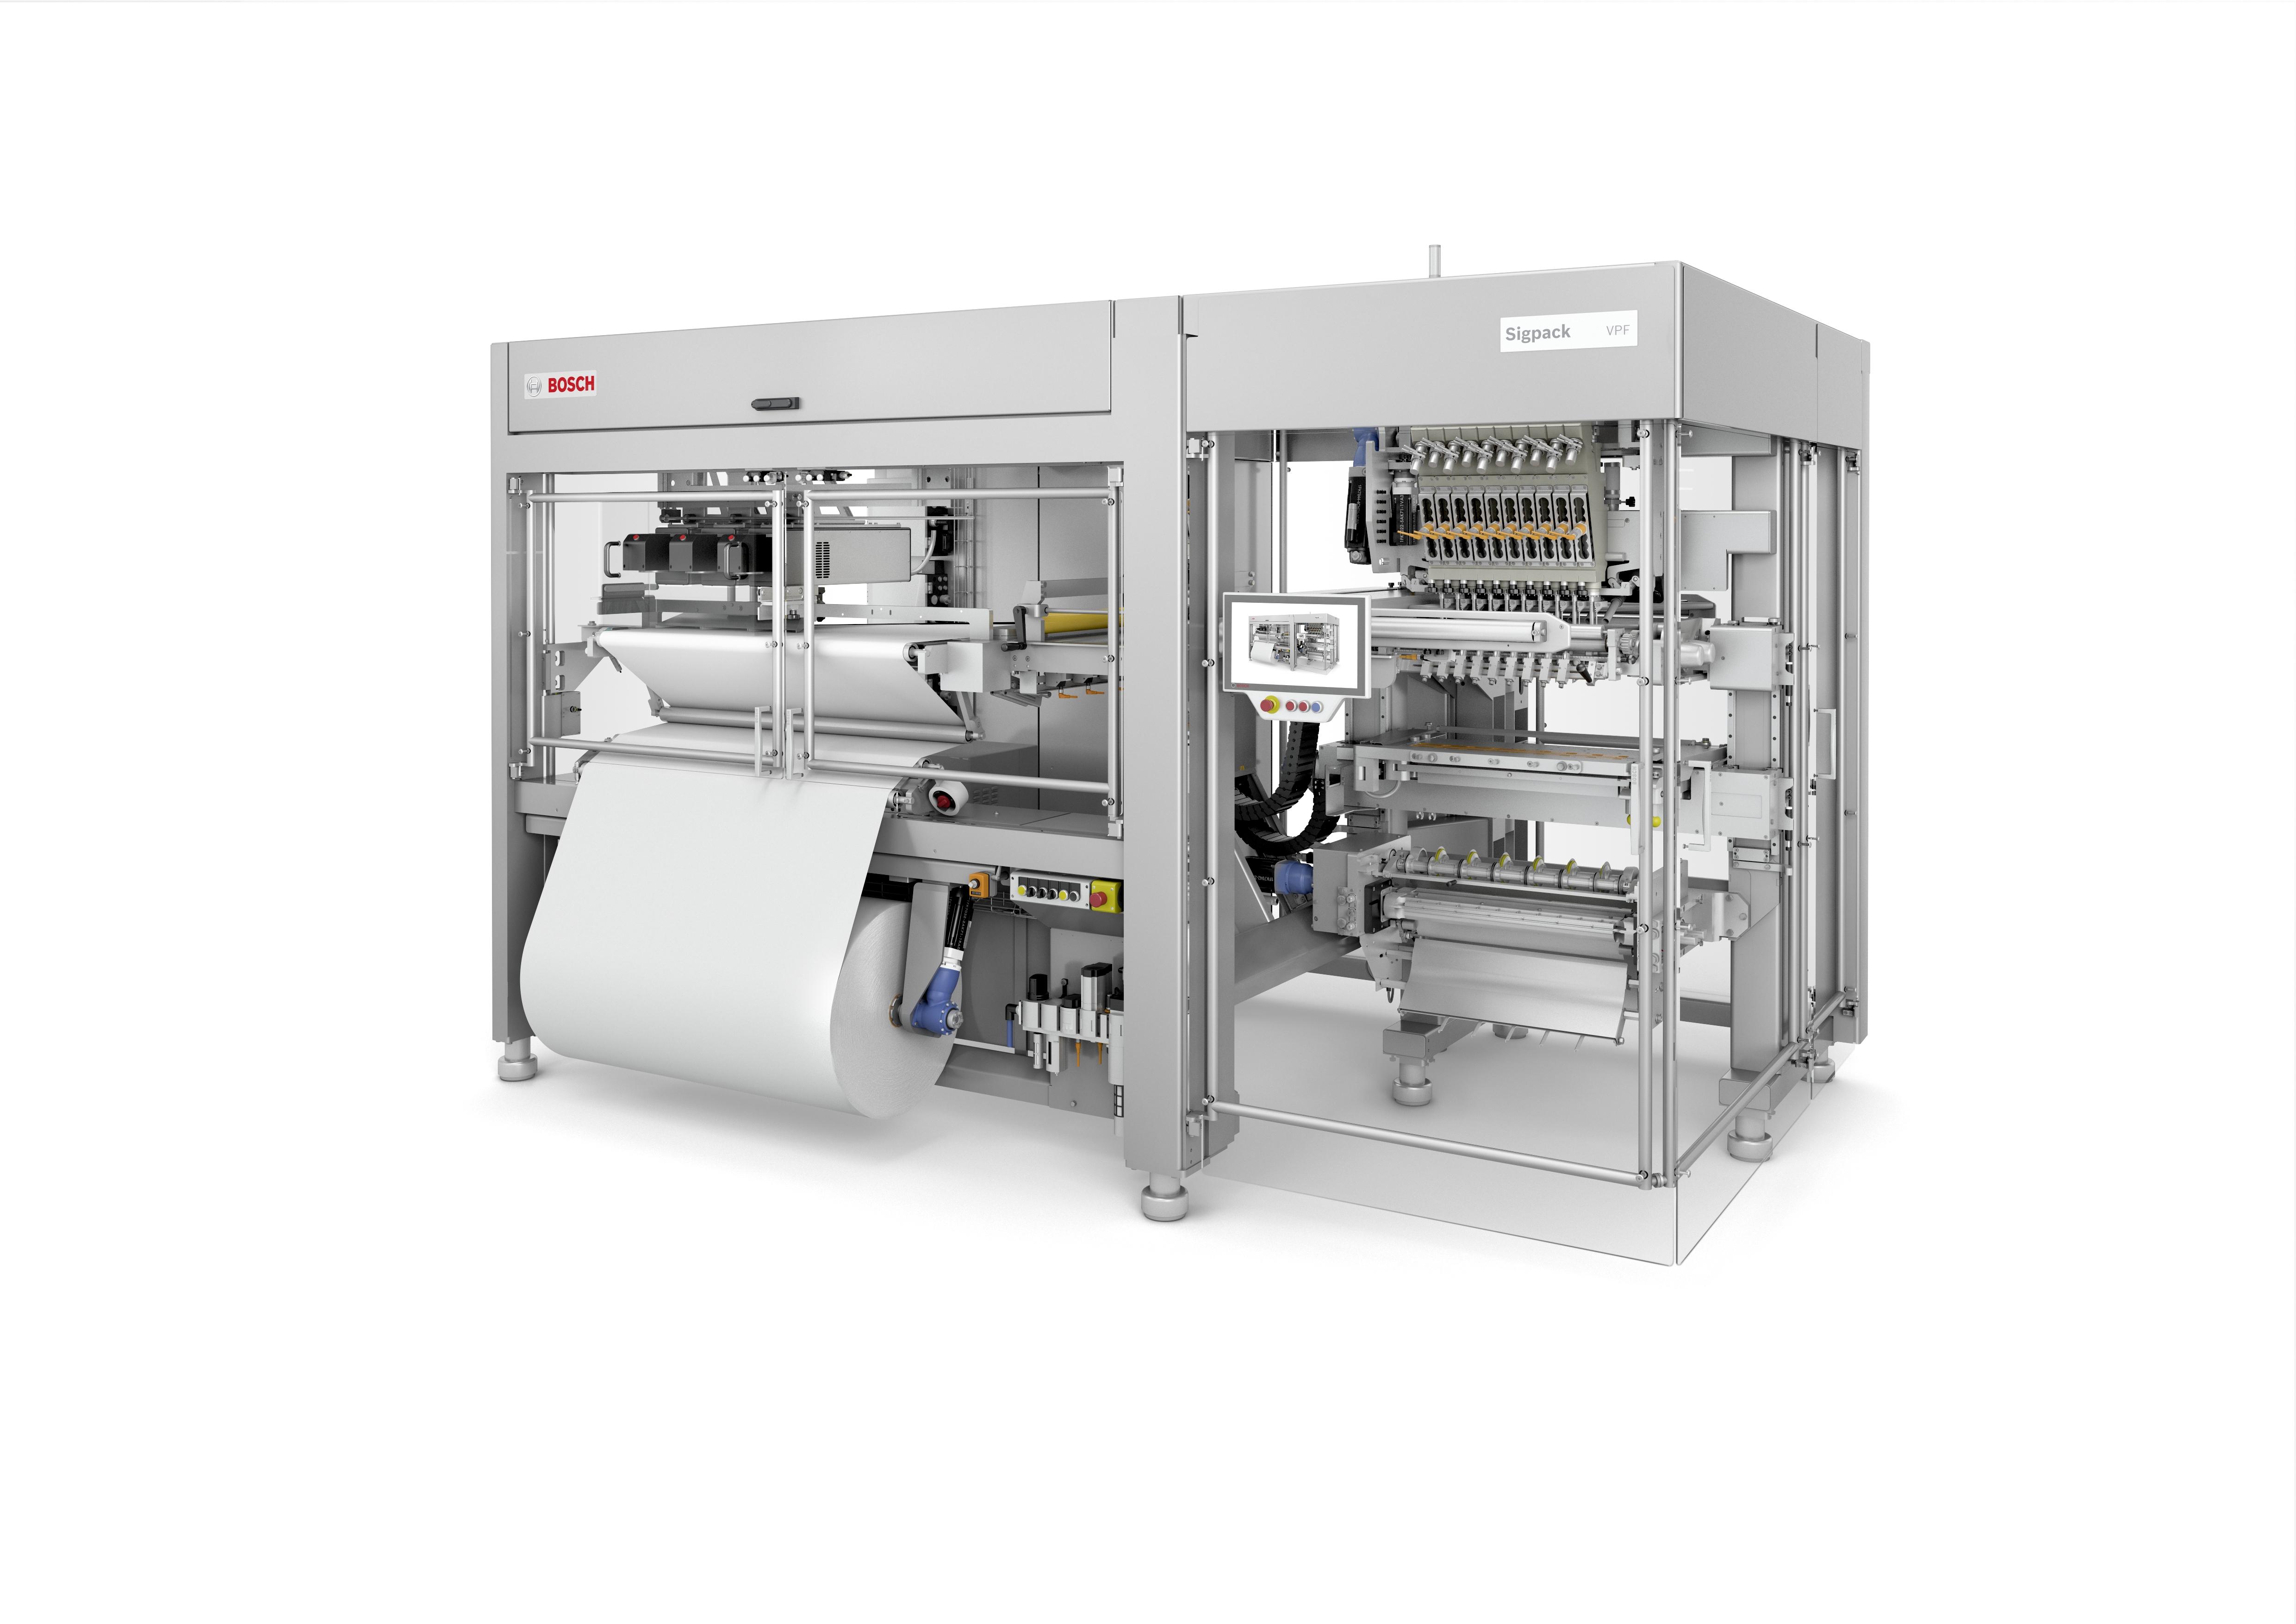 Bosch Sigpack VPF